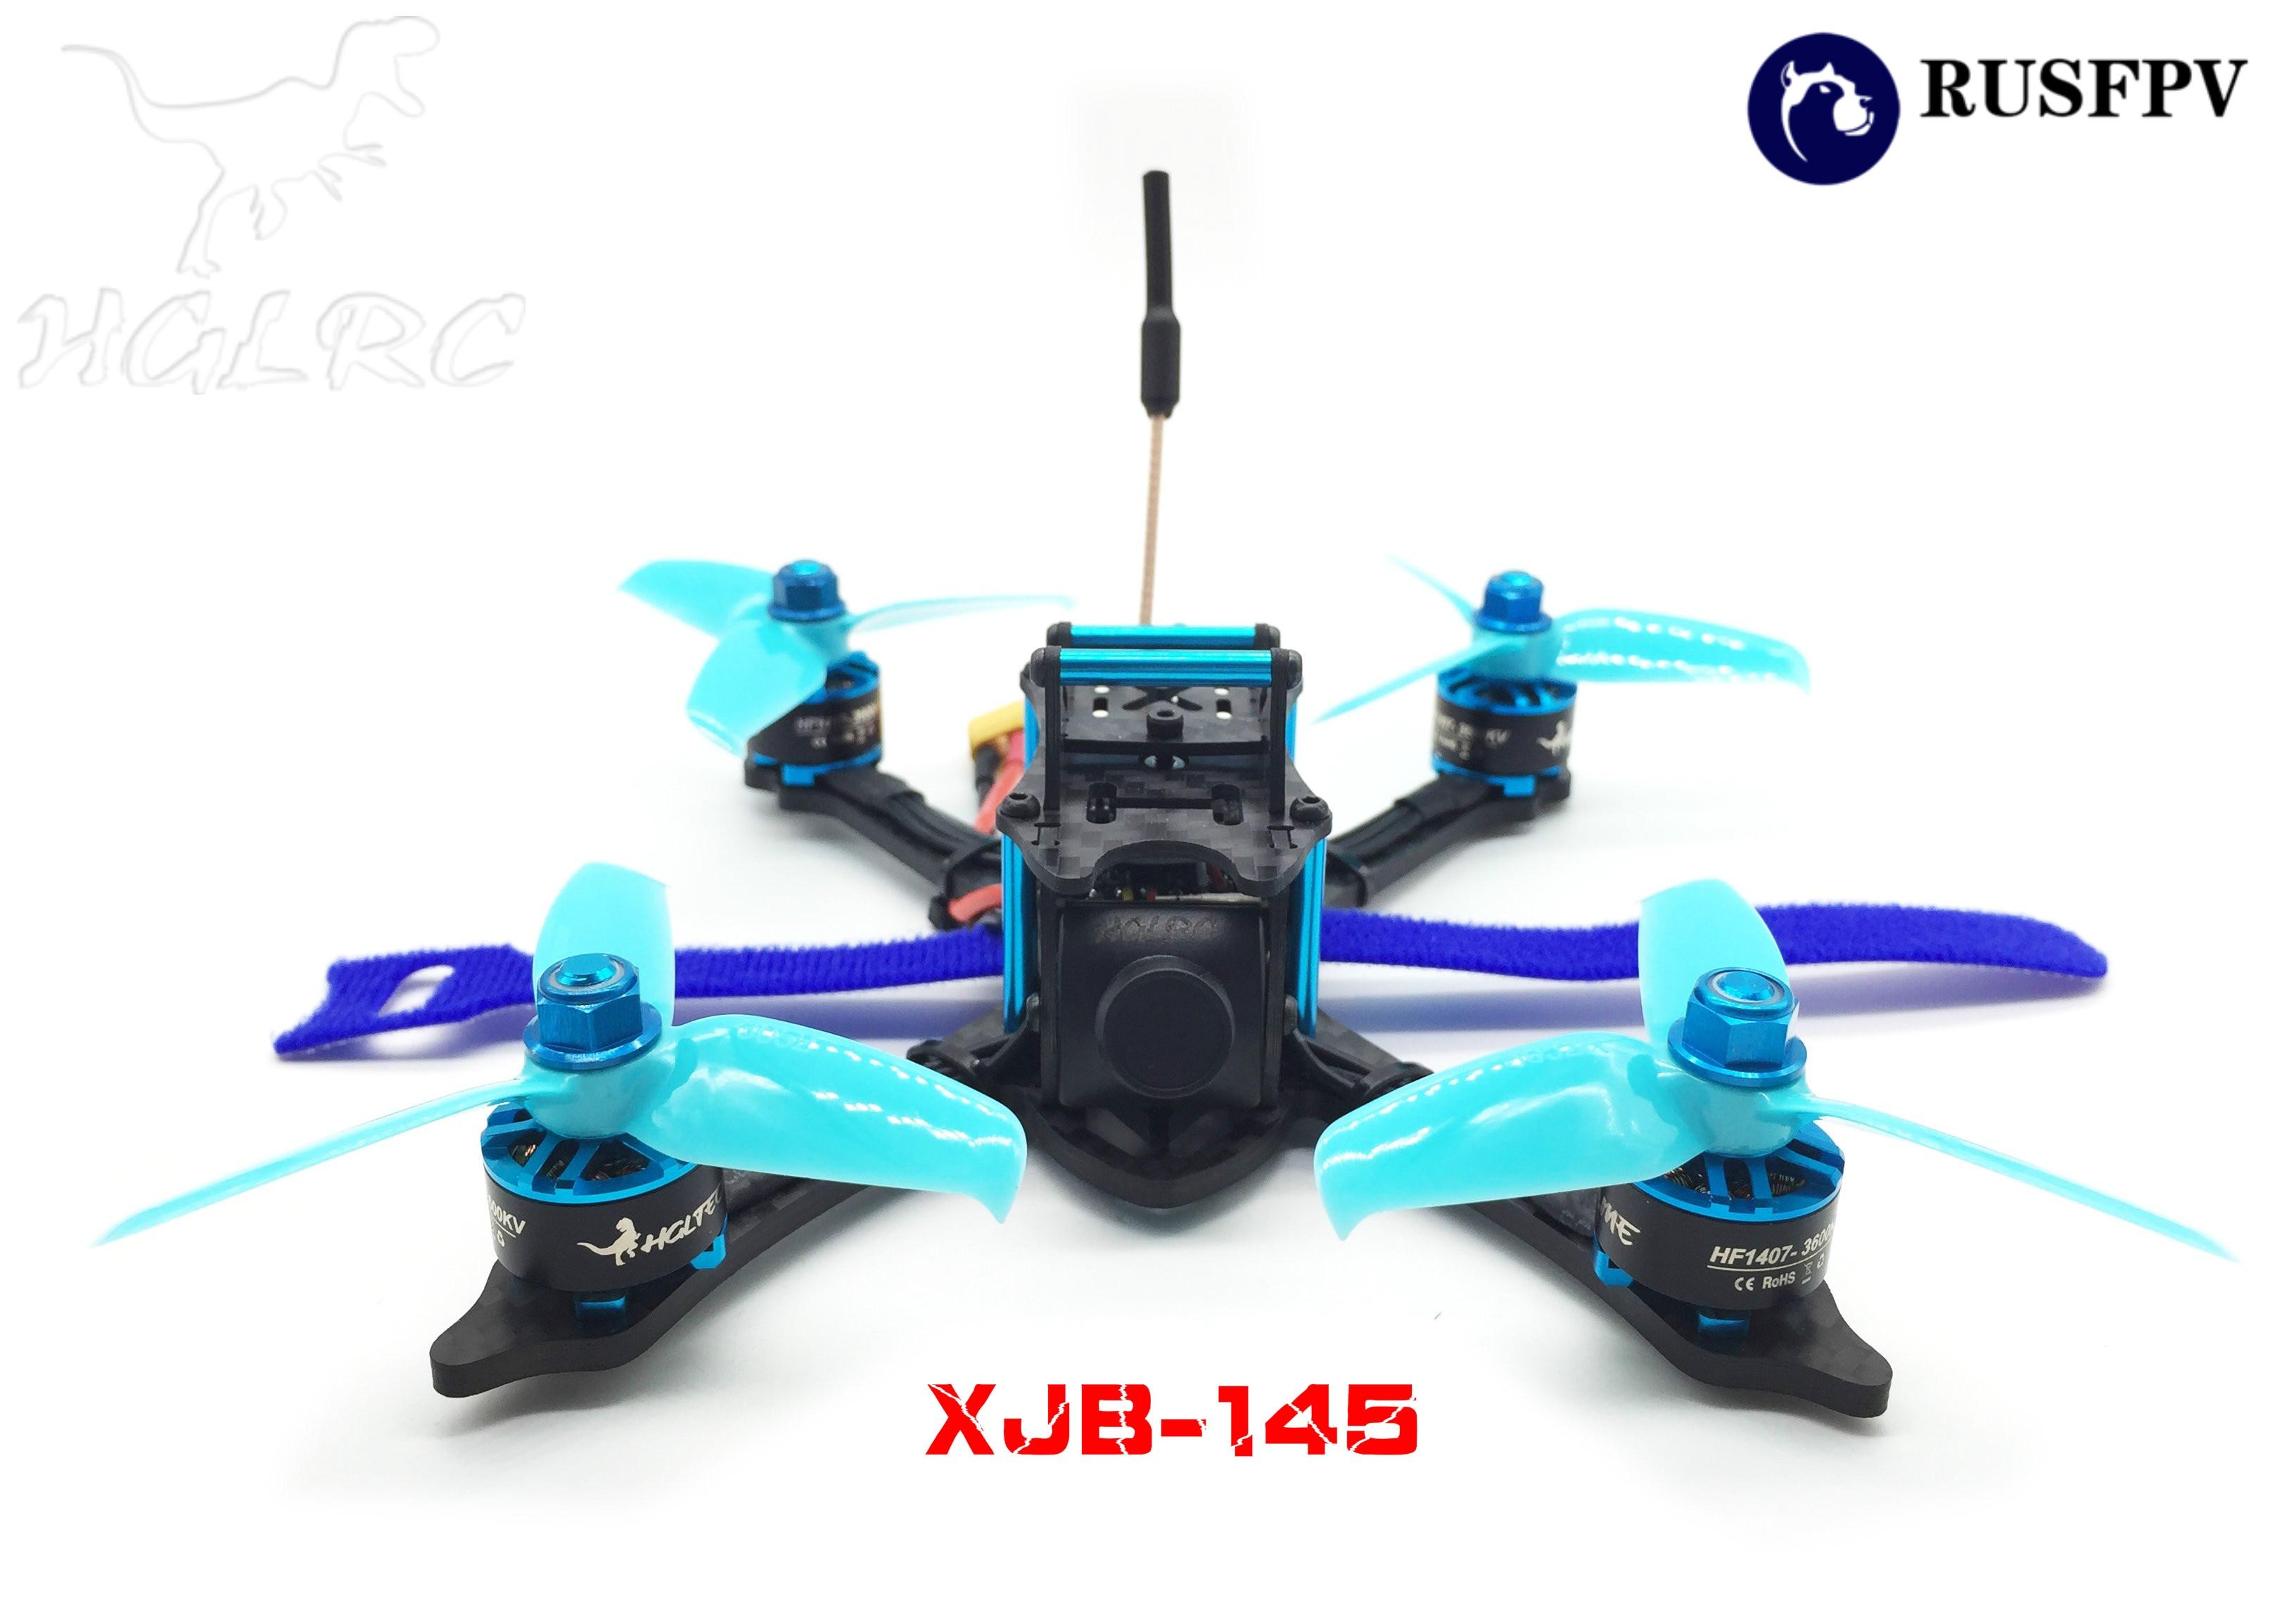 HGLRC XJB-145 145MM MICRO FPV RACING DRONE Omnibus F4 28A 2-4S Blheli_S ESC 25/100/200/350mW Switchable VTX PNP BLUE все цены